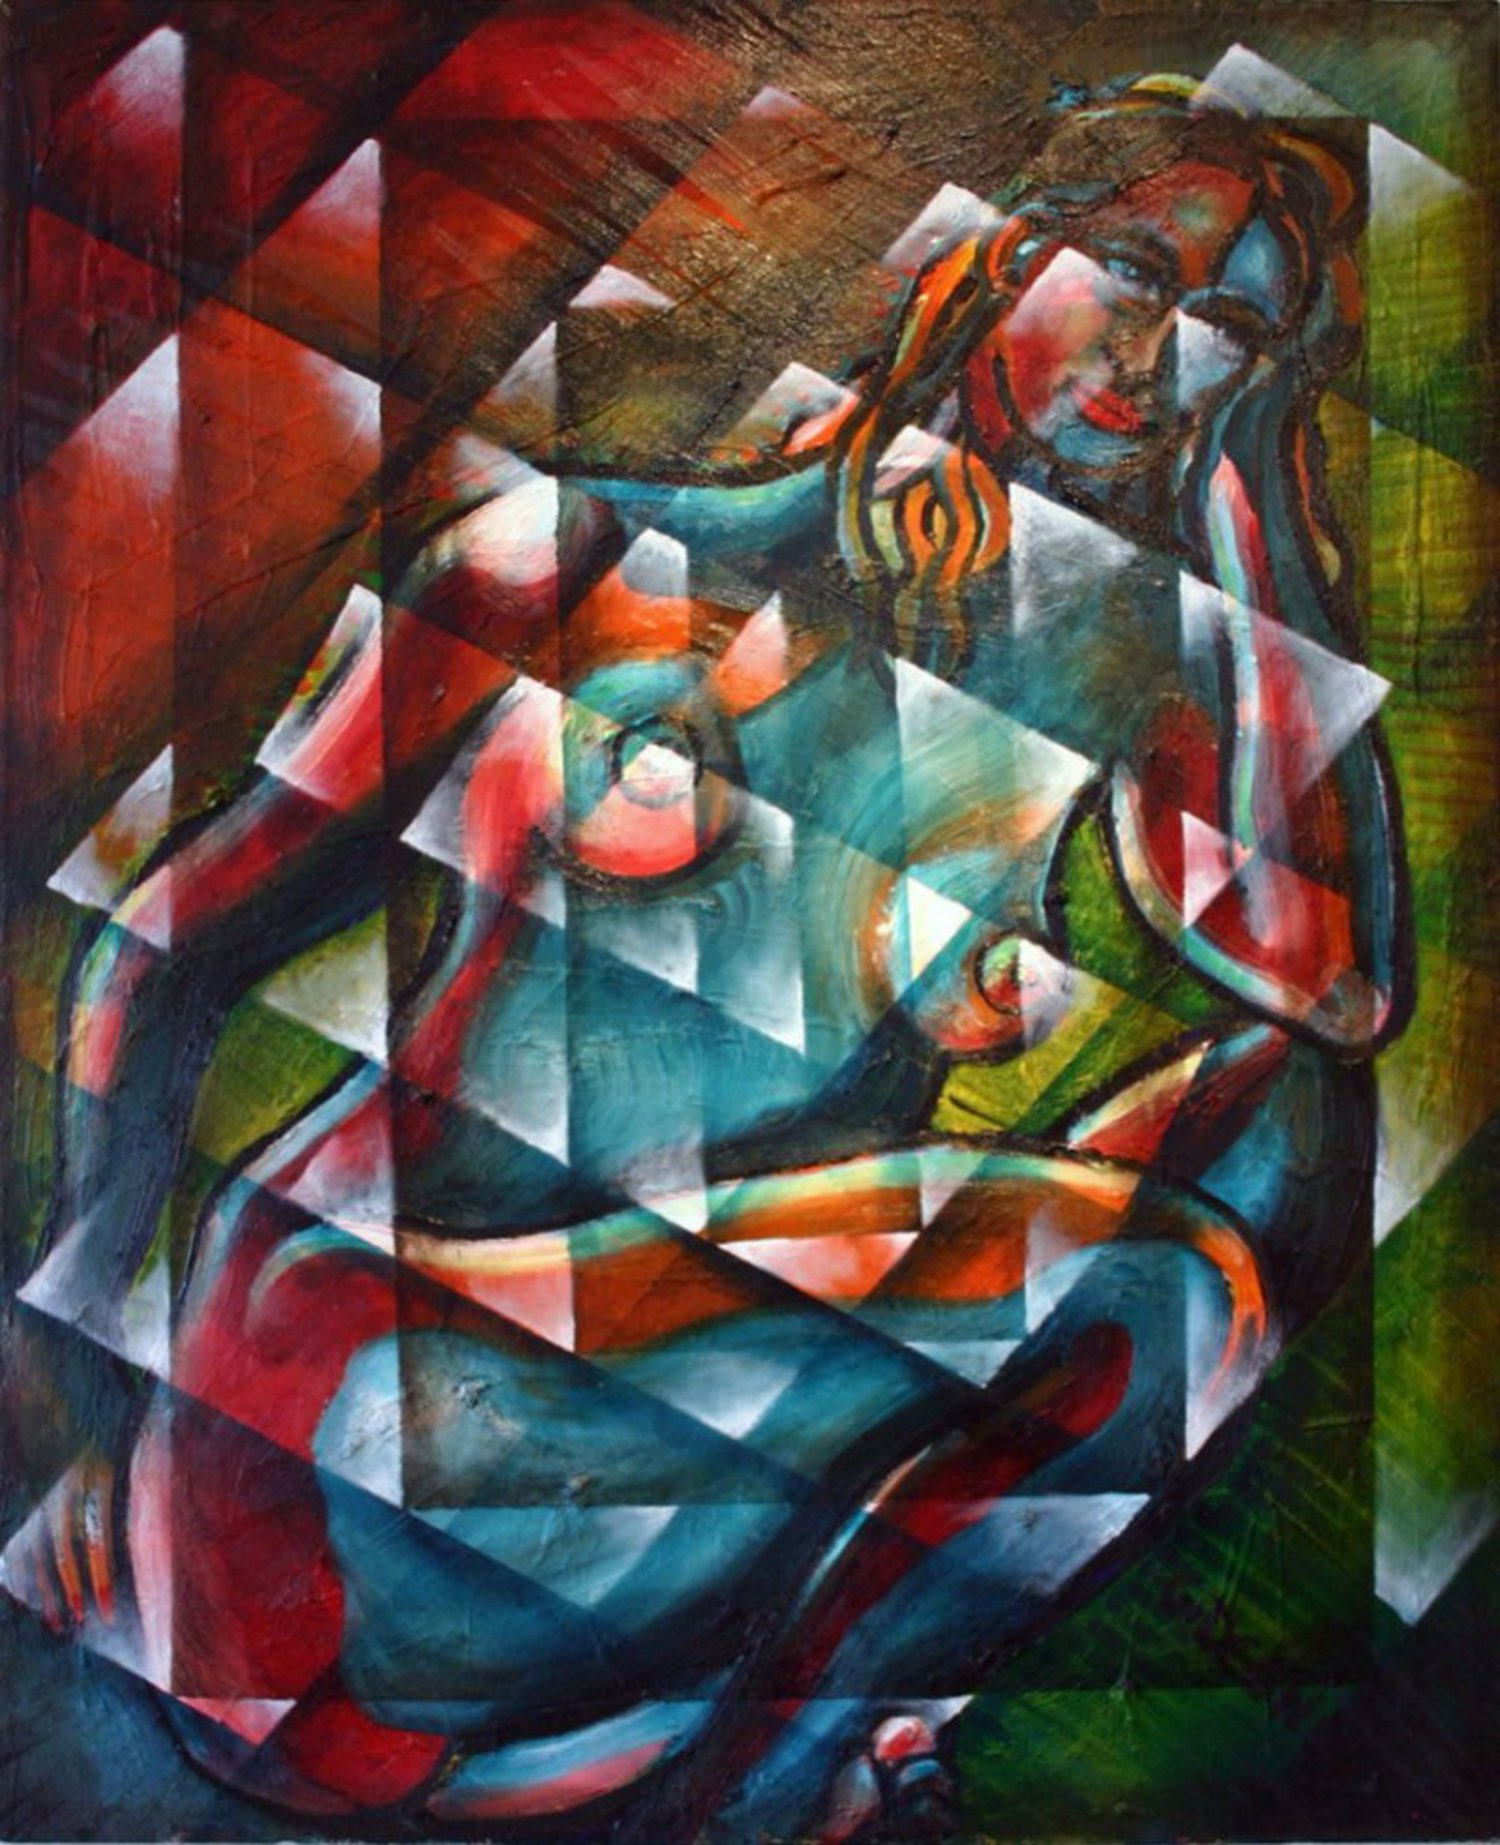 Artwork by Gideon Cohn